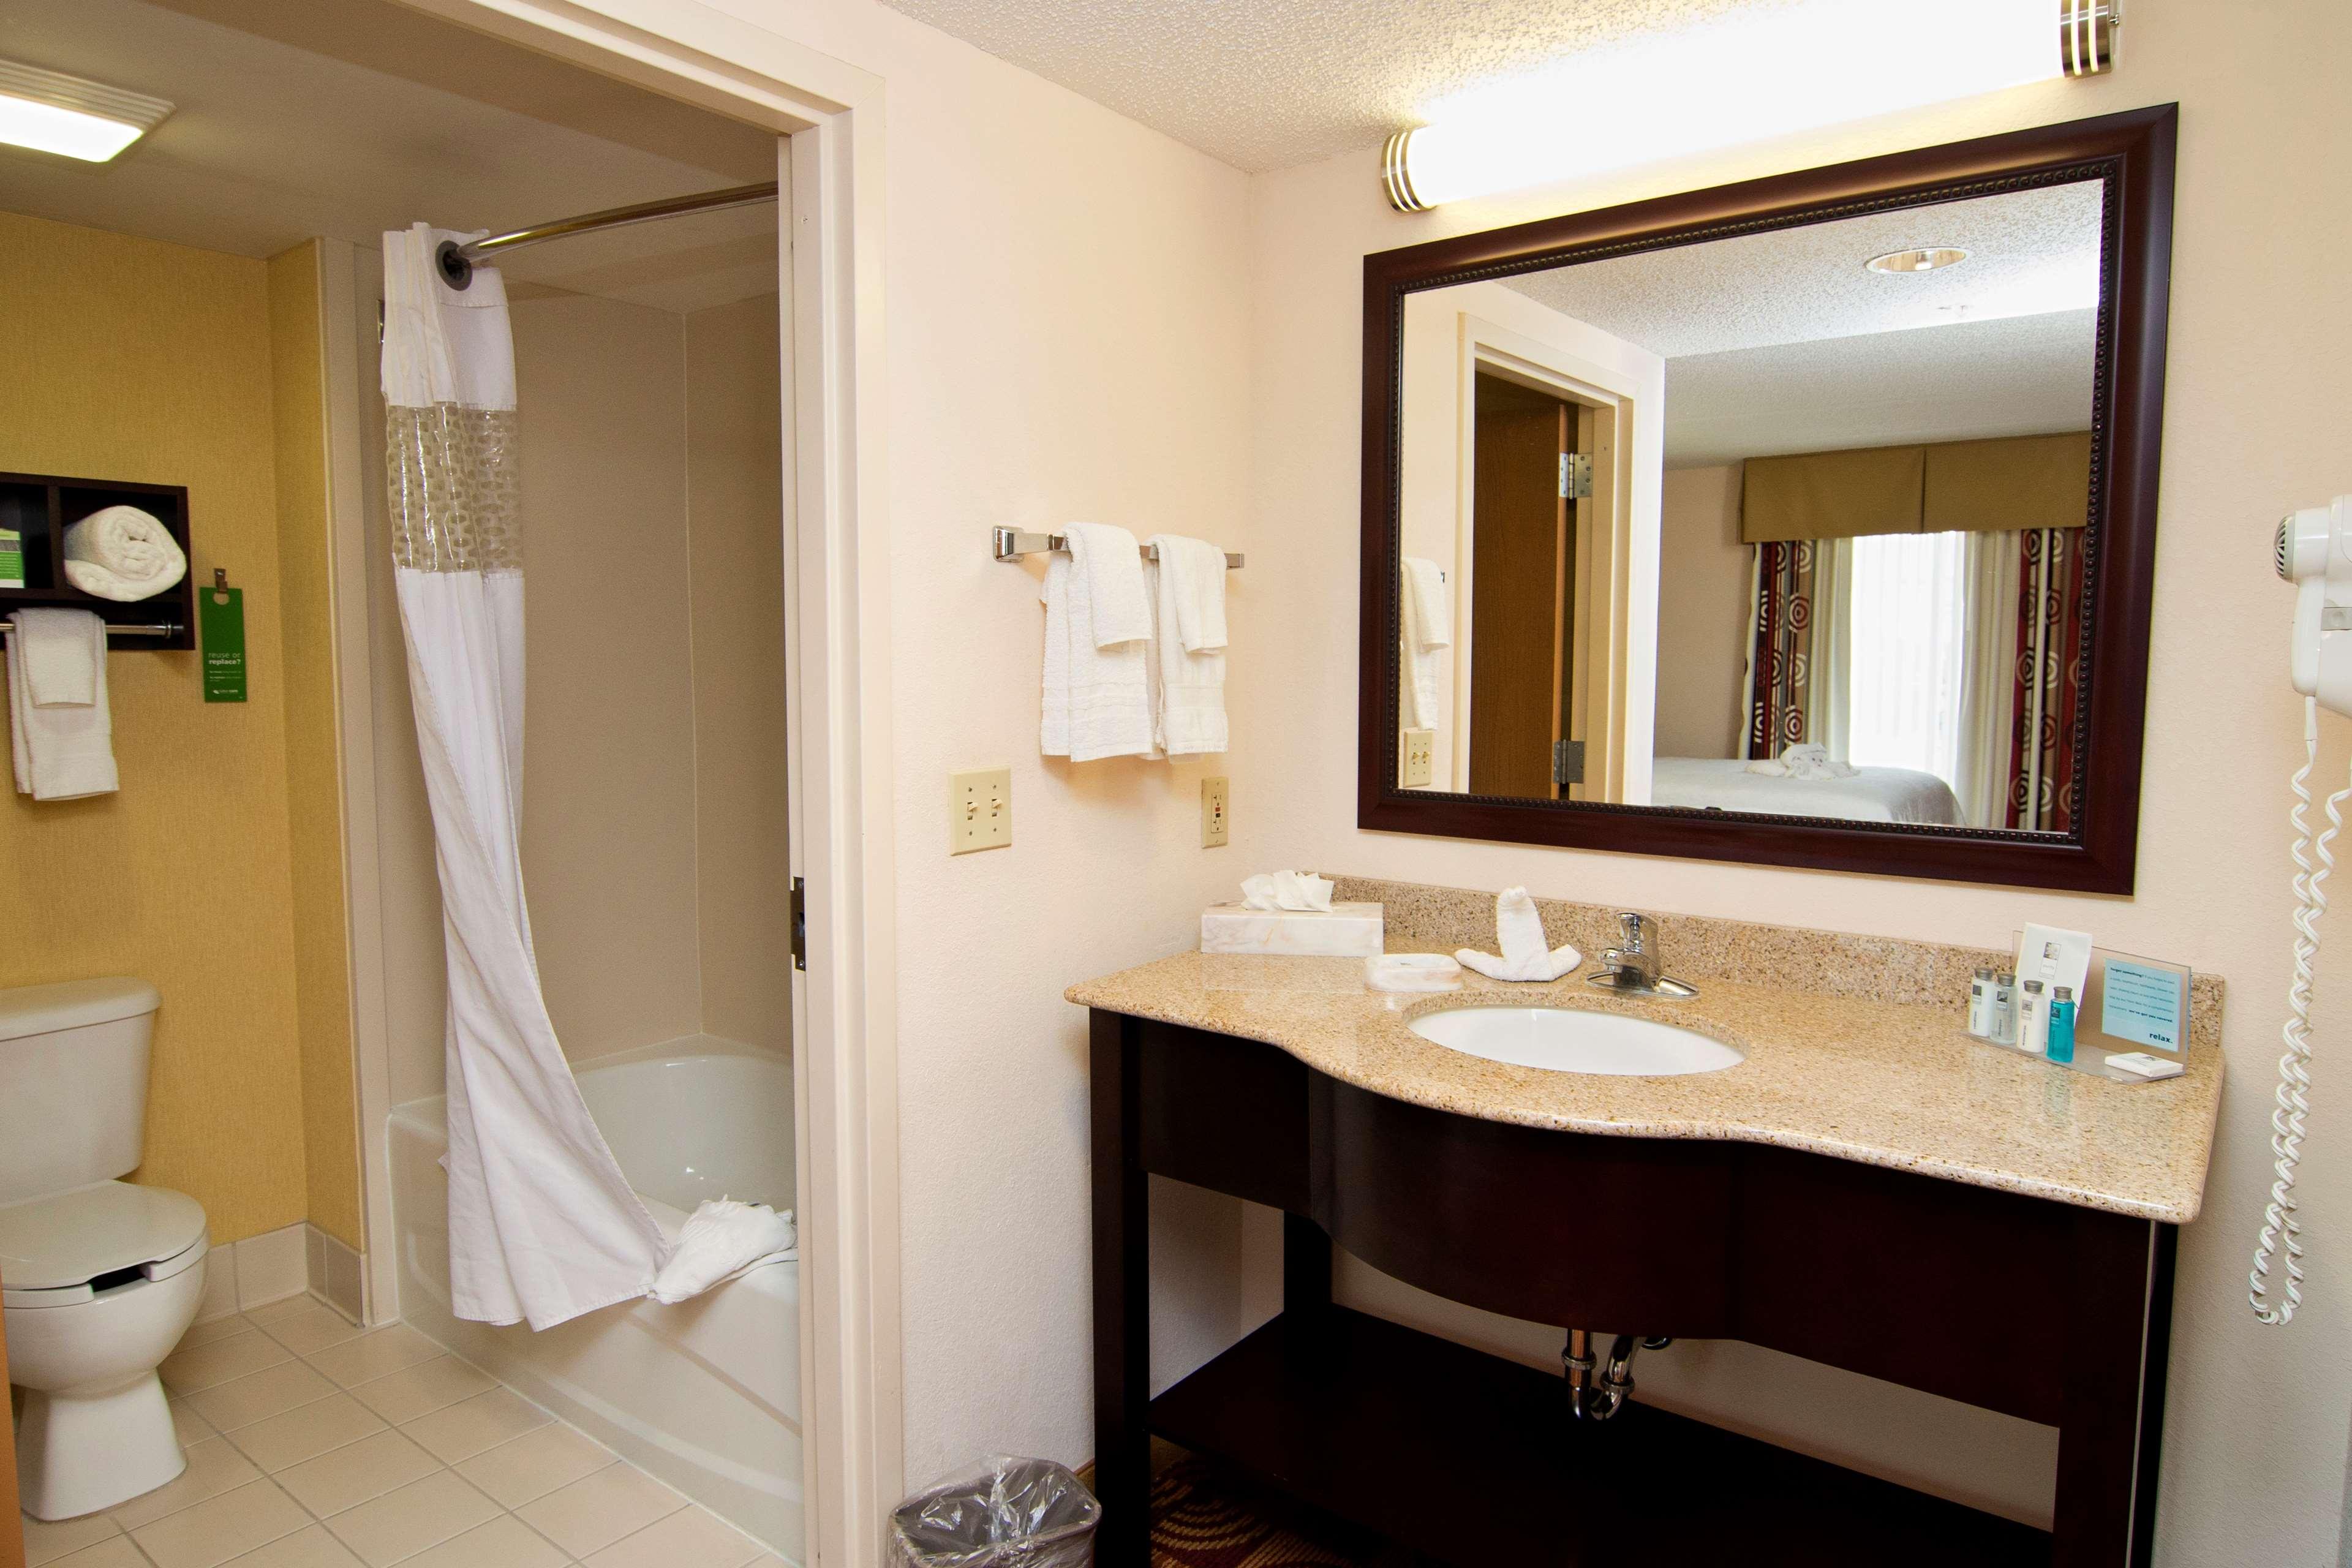 Hampton Inn & Suites Orlando Intl Dr N image 16